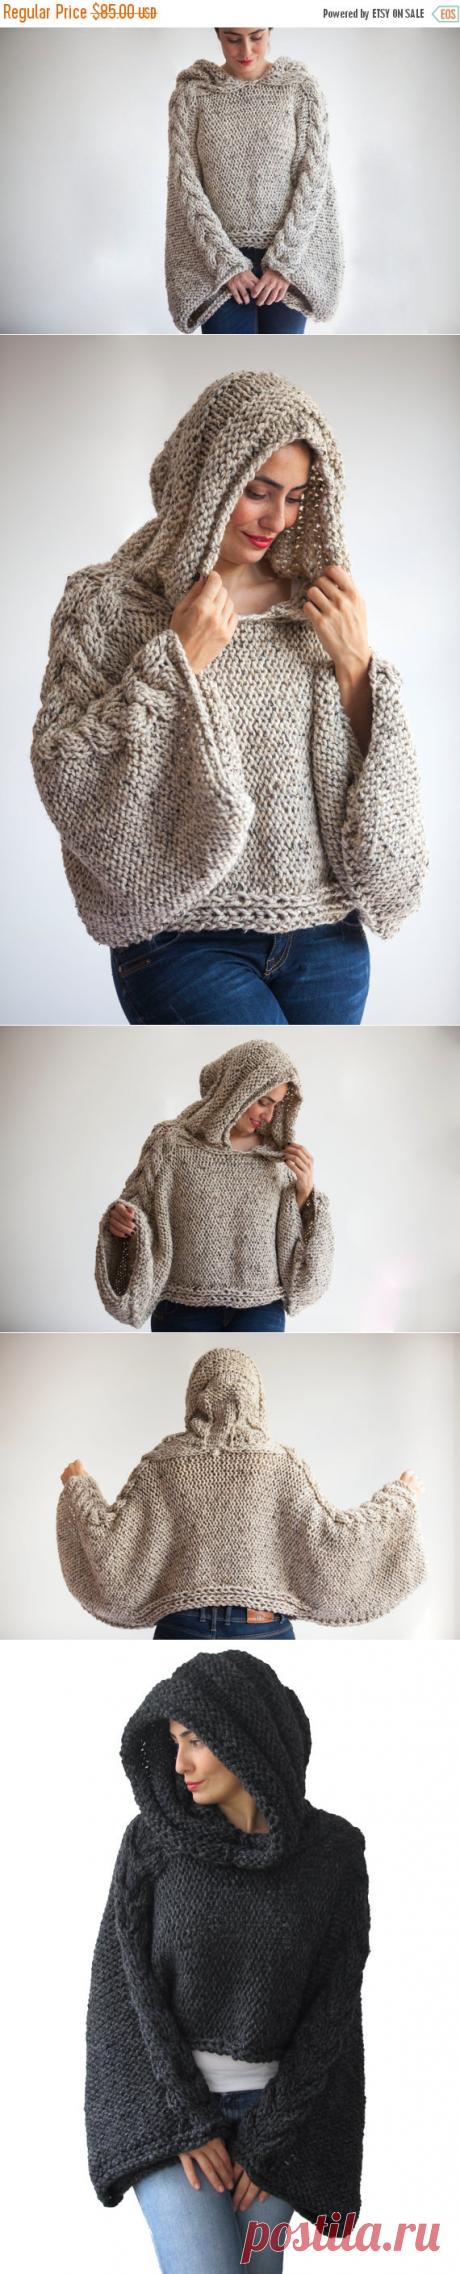 WINTER SALE 20% Tweed Beige Angel Sweater Capalet with от afra